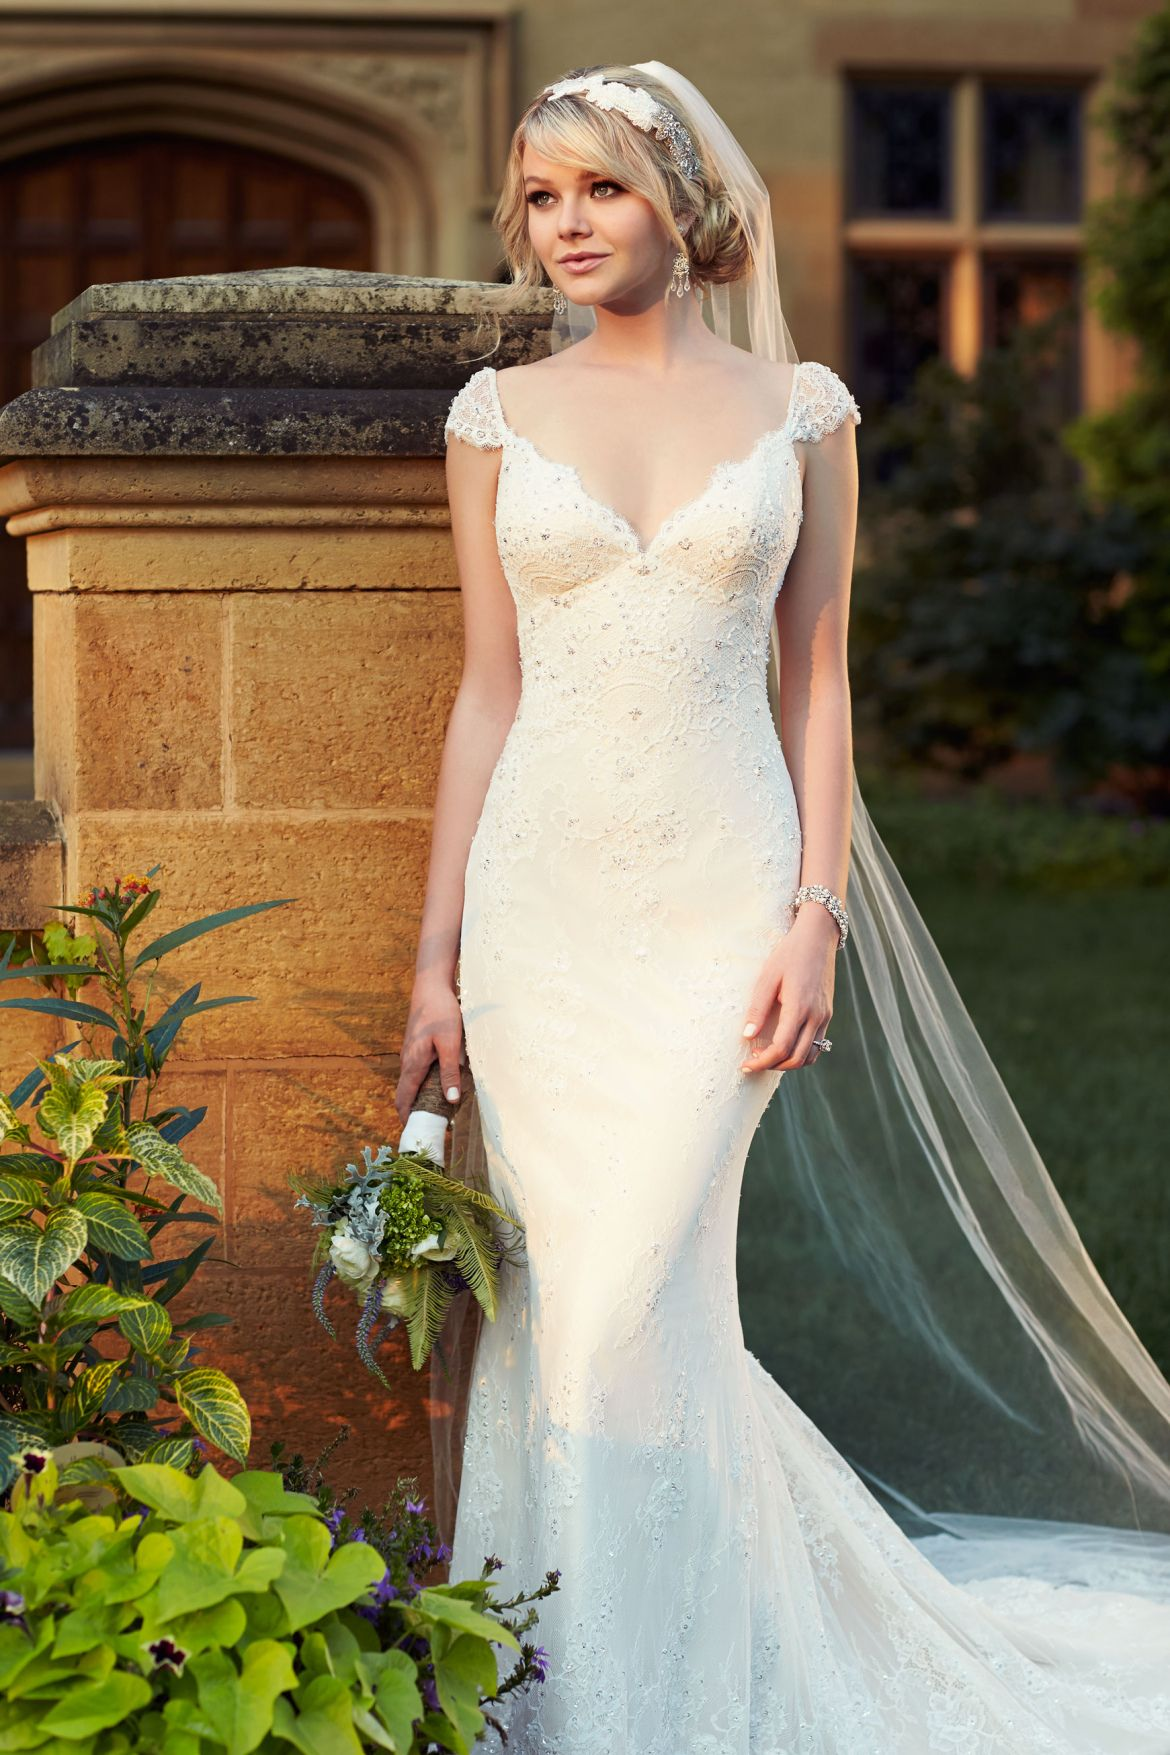 Mature bride wedding dresses   Best Wedding Dresses Australia  Wedding Dresses for the Mature